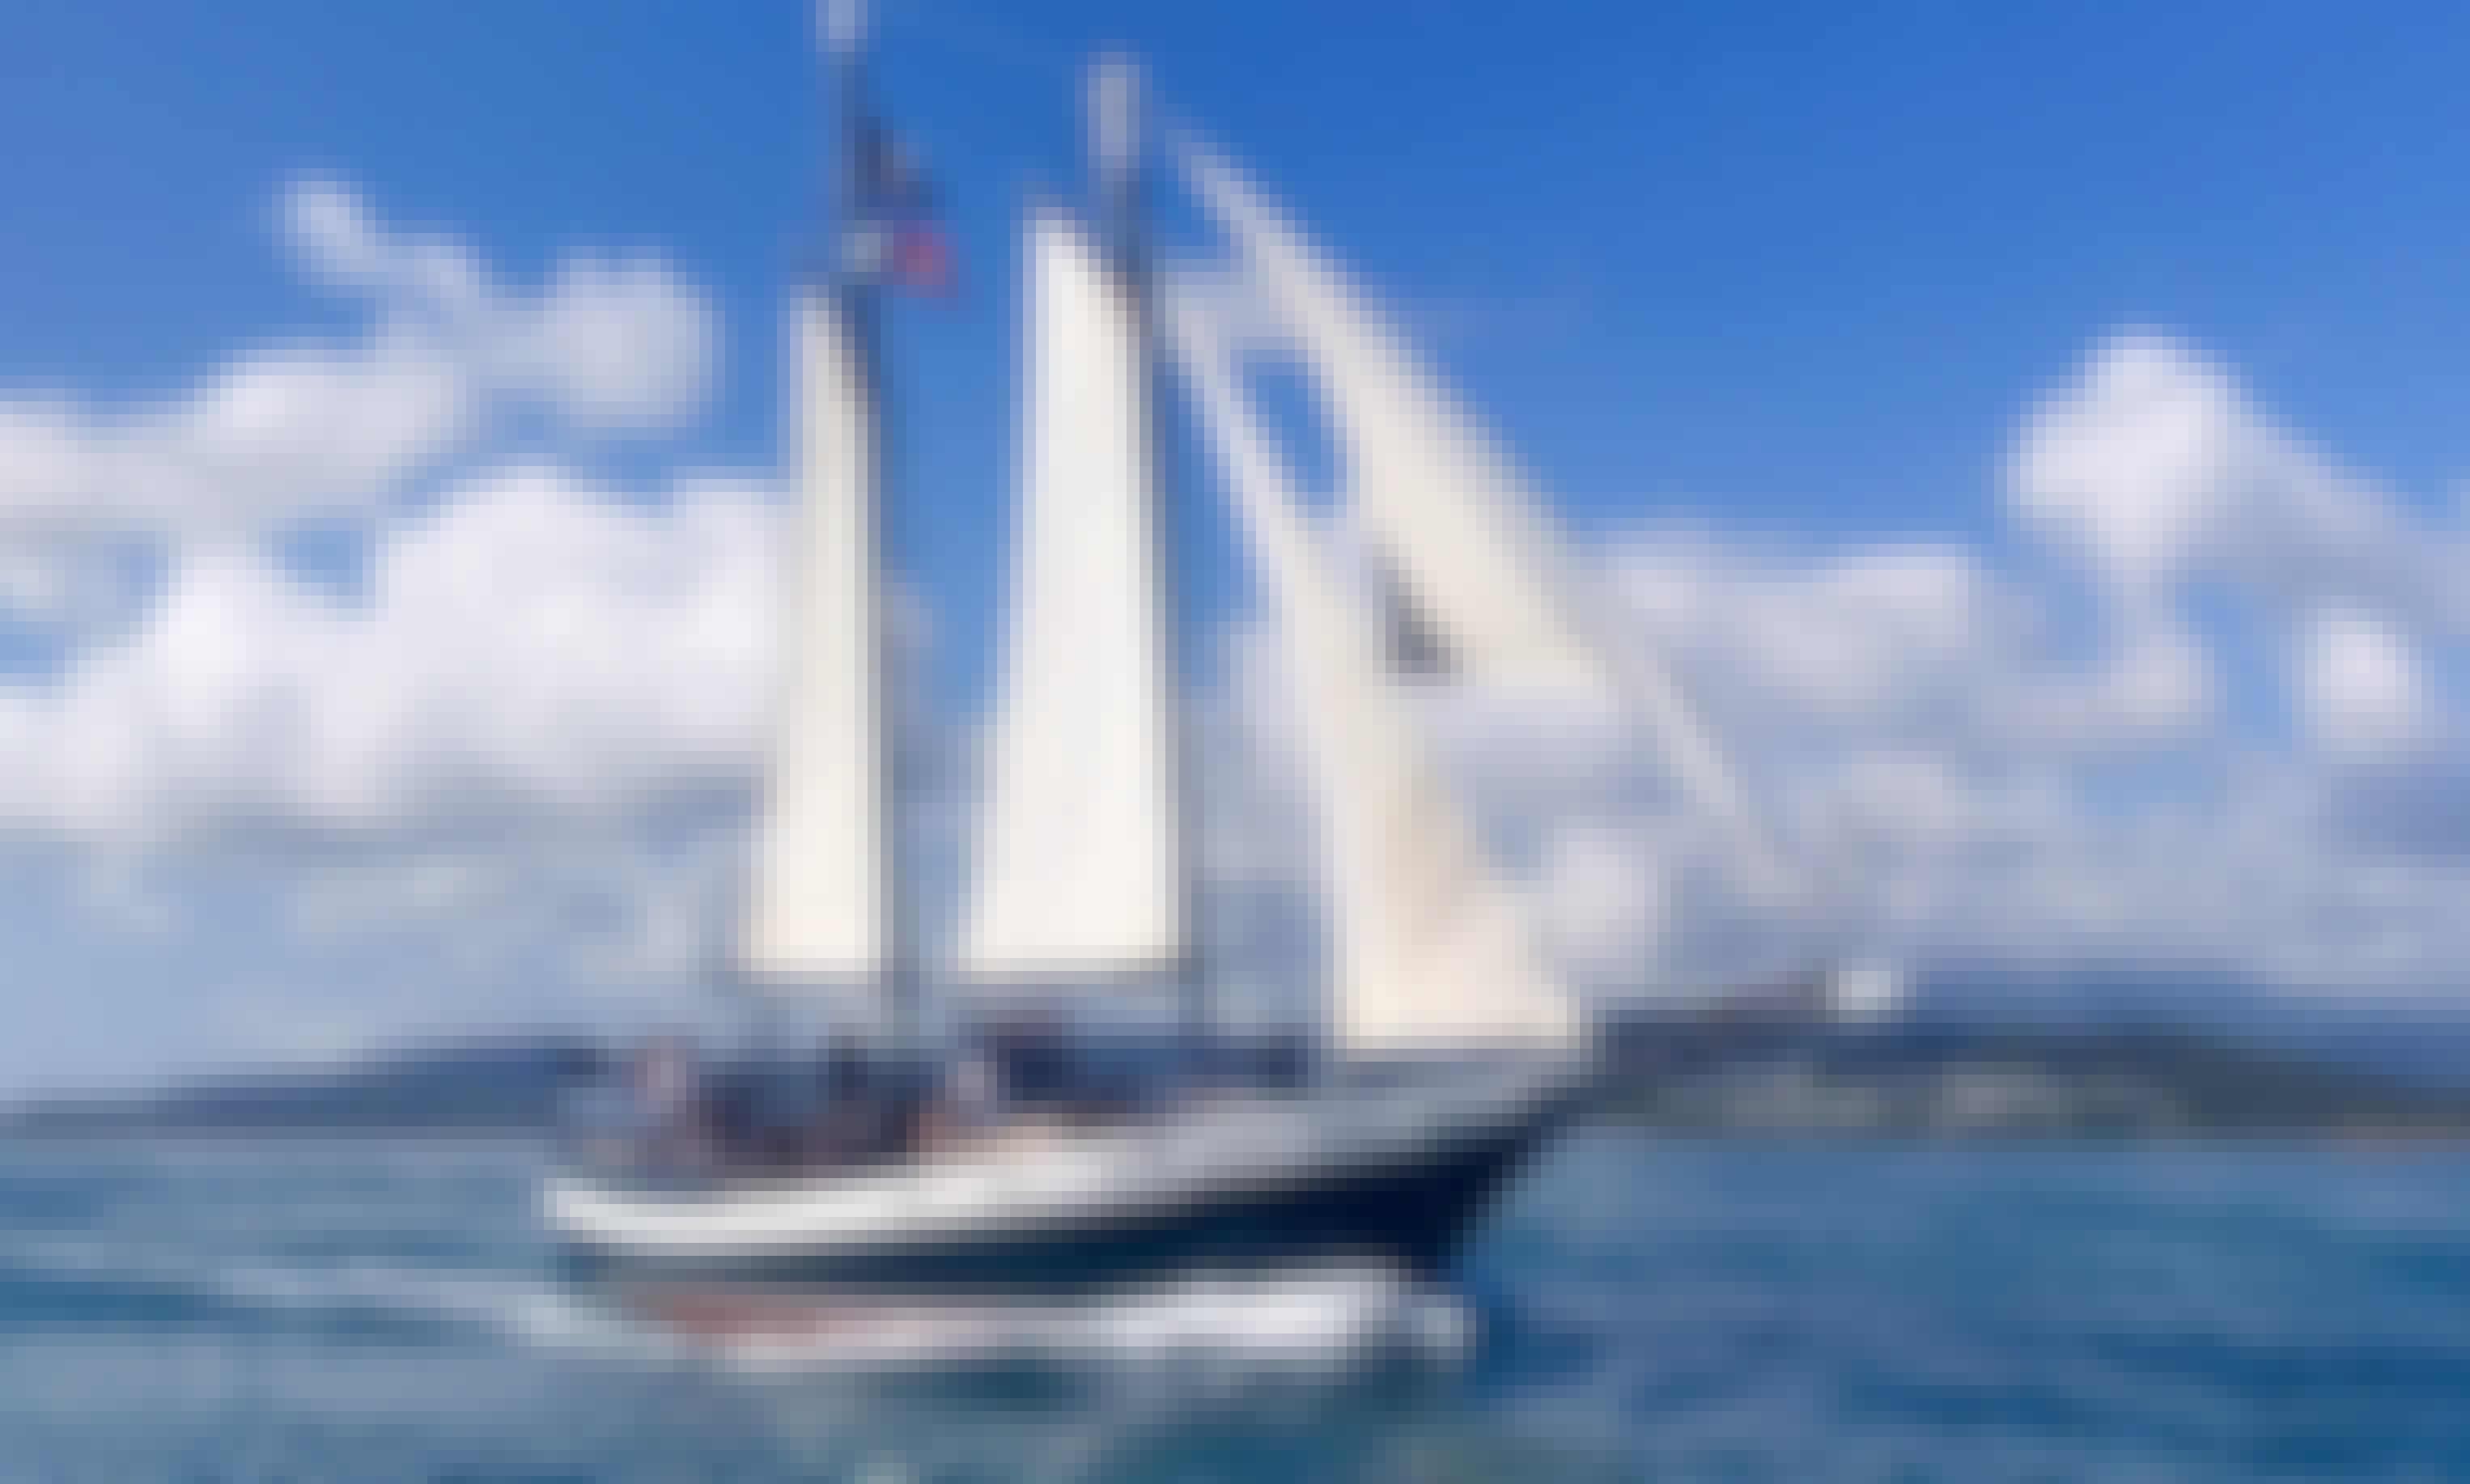 Calico Jack Pirate Ship Day Charter - Fajardo, Puerto Rico